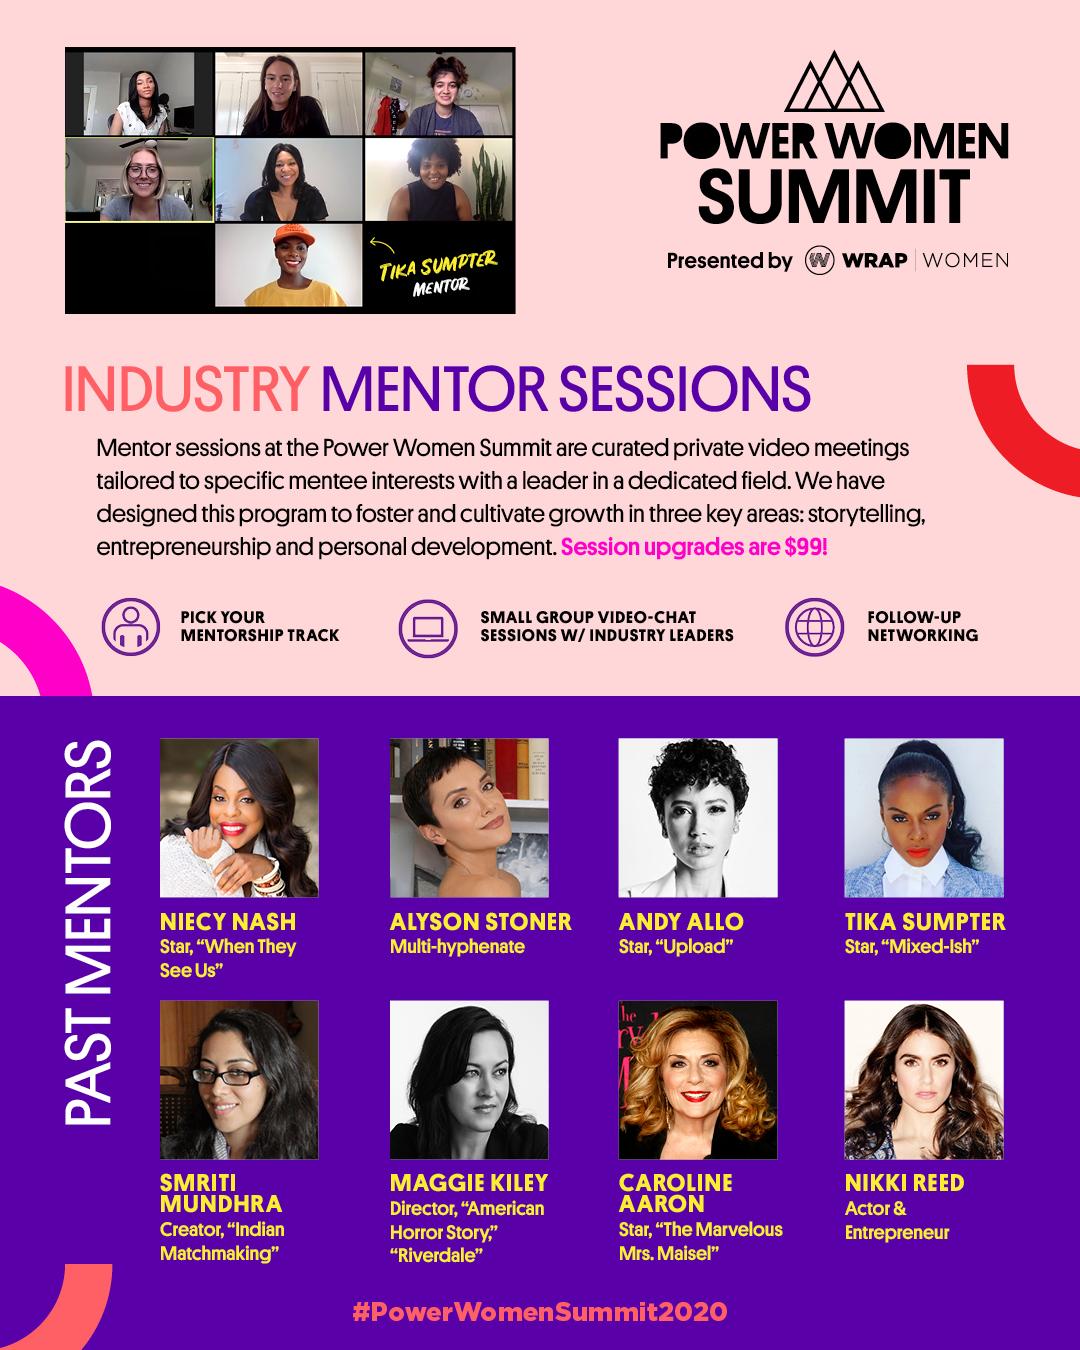 The Wrap's Power Women Summit 2020